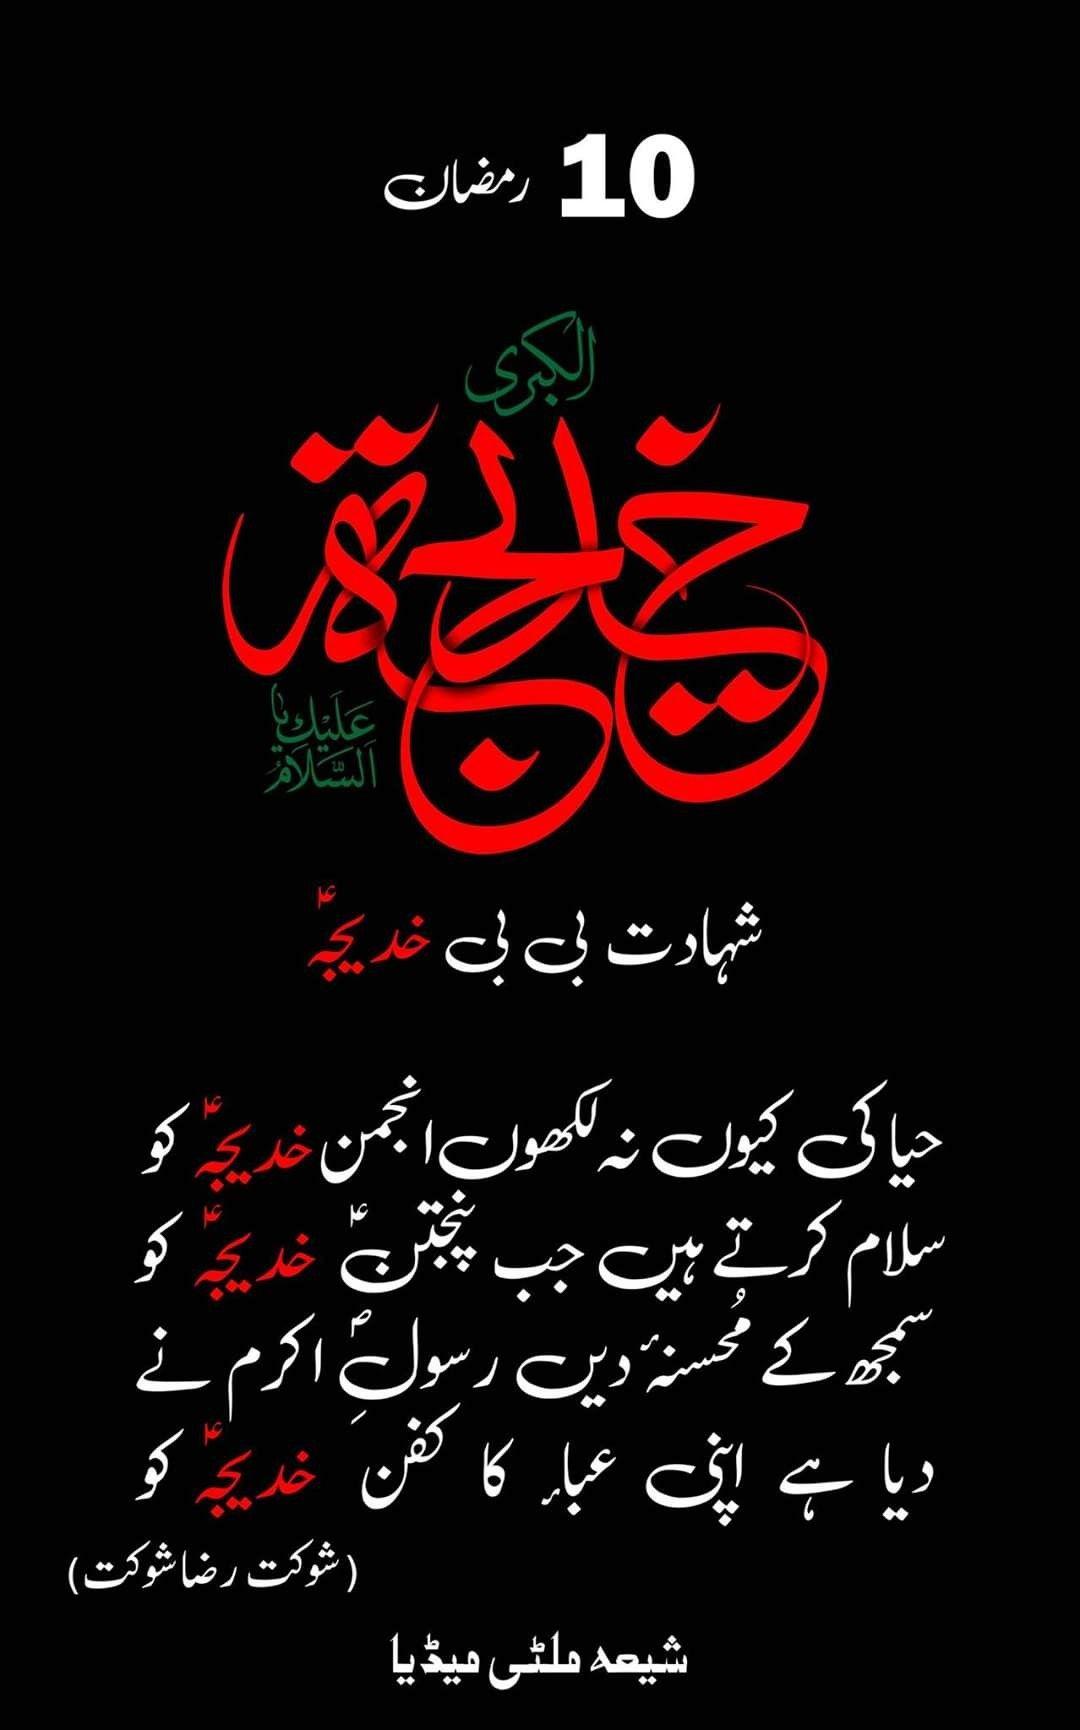 Wafat E Bibi Khadija S A Shia Multimedia Team Smt Urdu Funny Poetry Quran Verses Shia